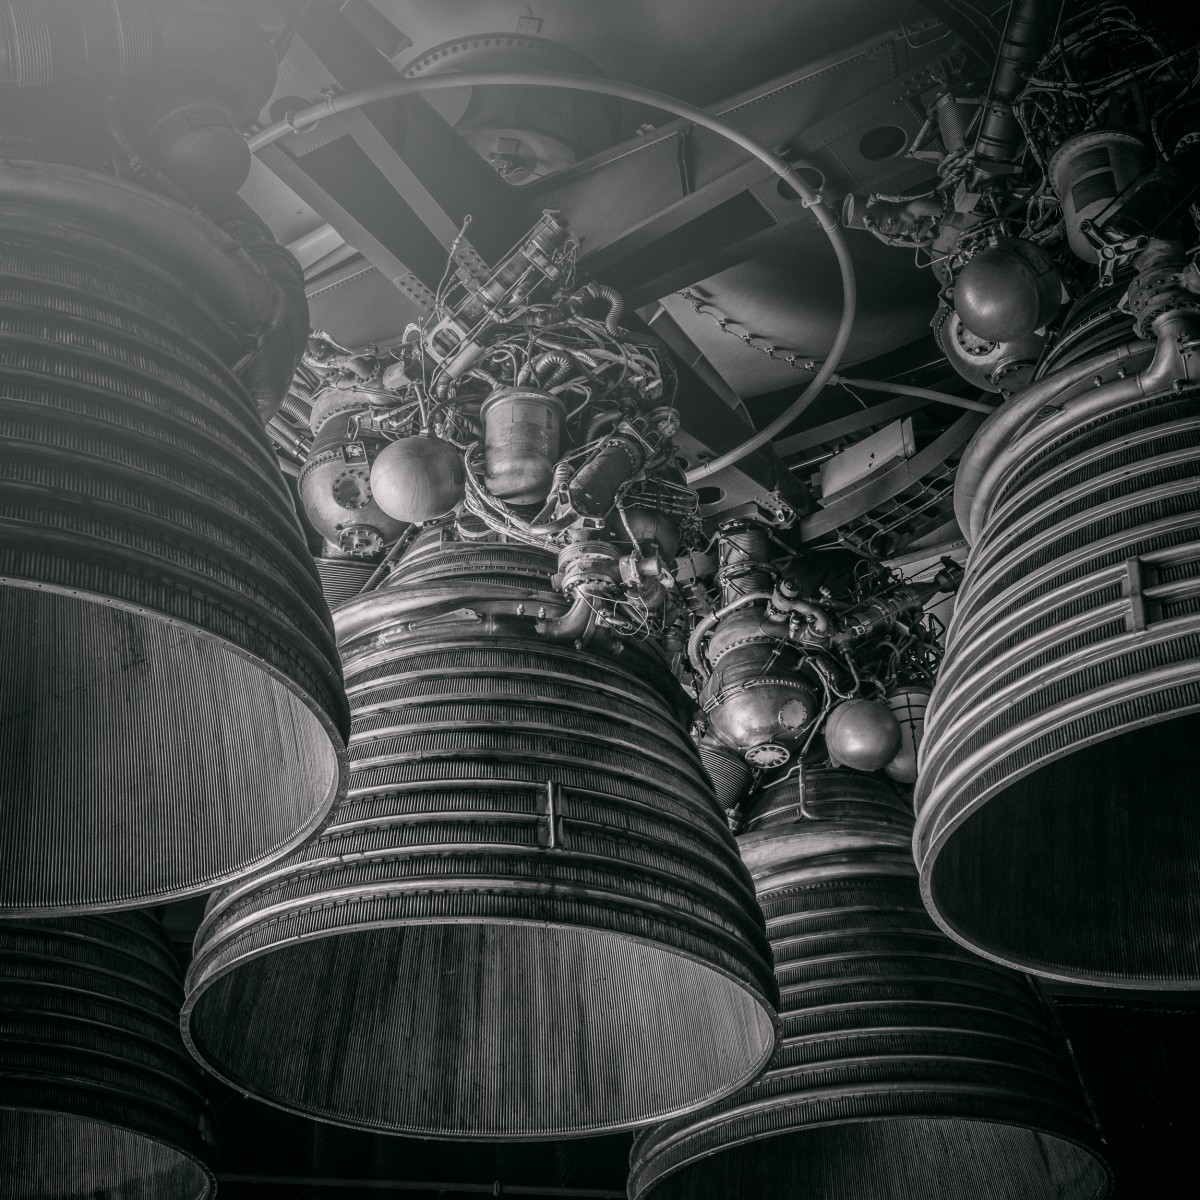 Saturn V #5 by Morgan Silk